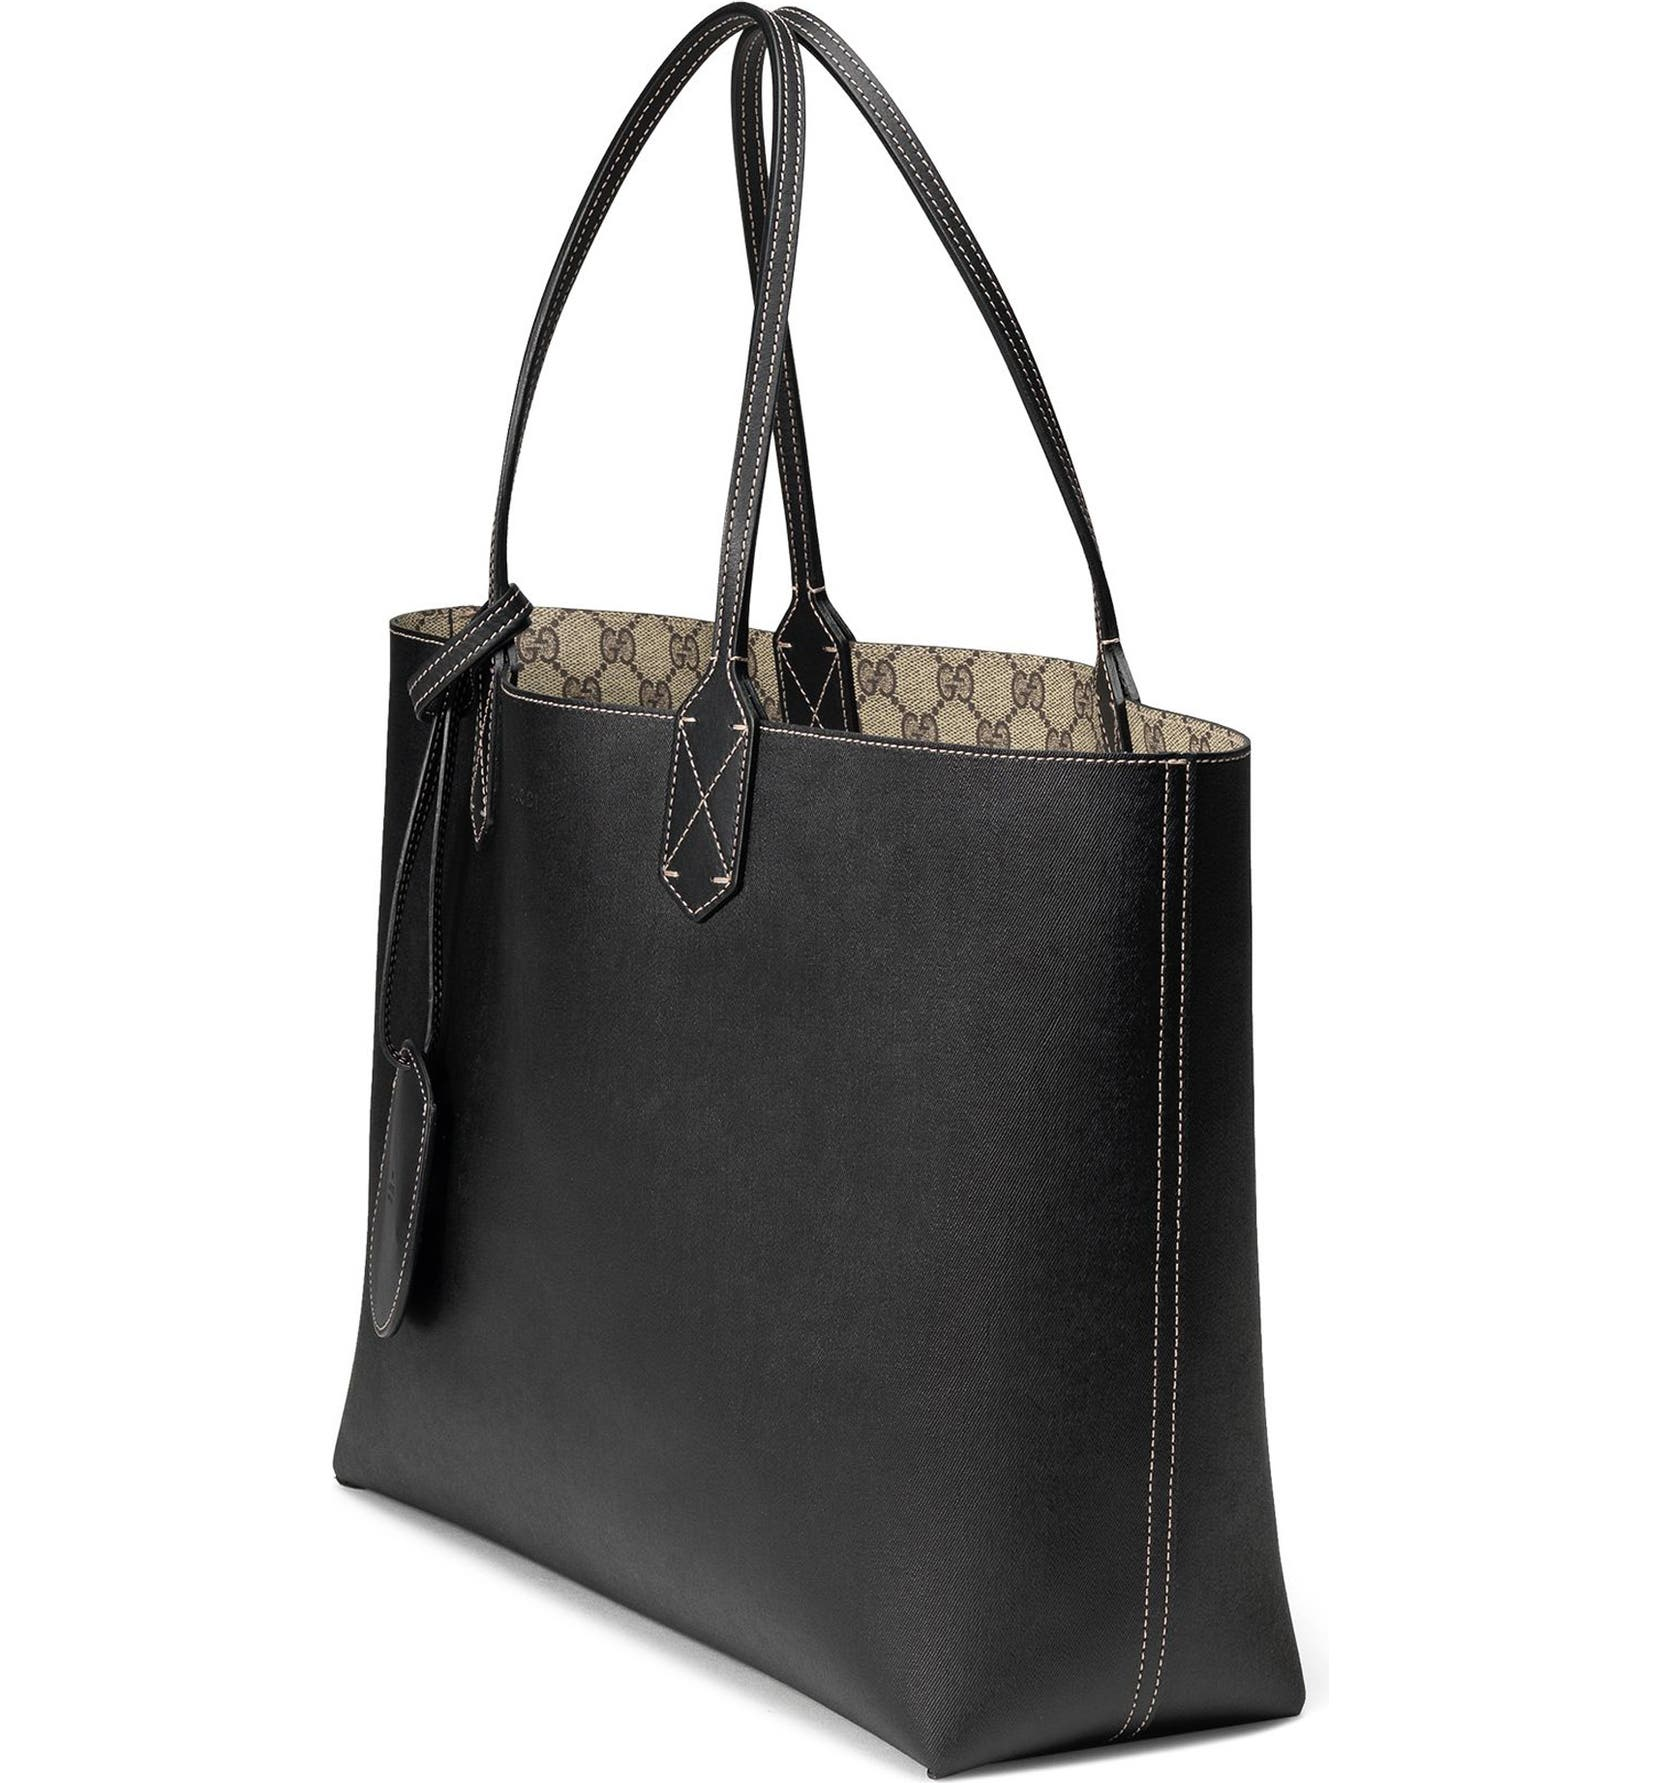 4856464fcbf6 Gucci Medium Turnaround Reversible Leather Tote | Nordstrom